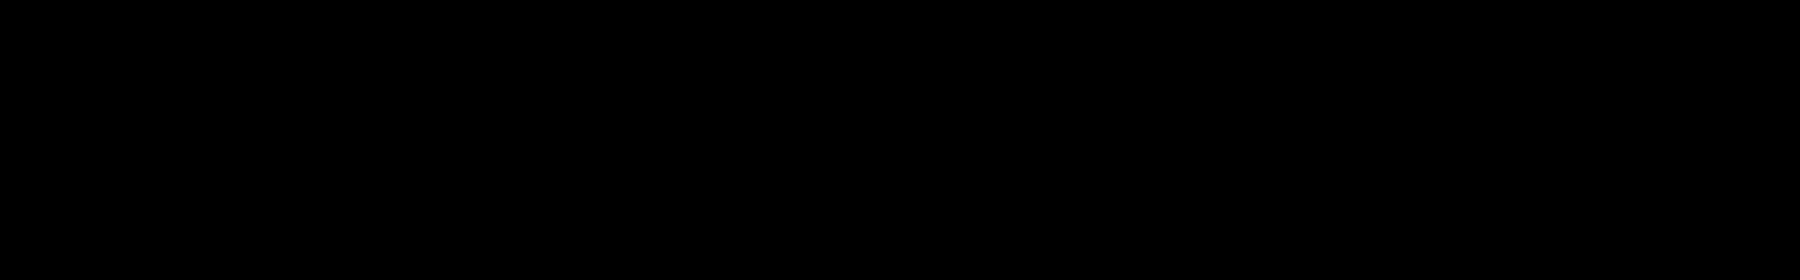 Chrome Heart audio waveform